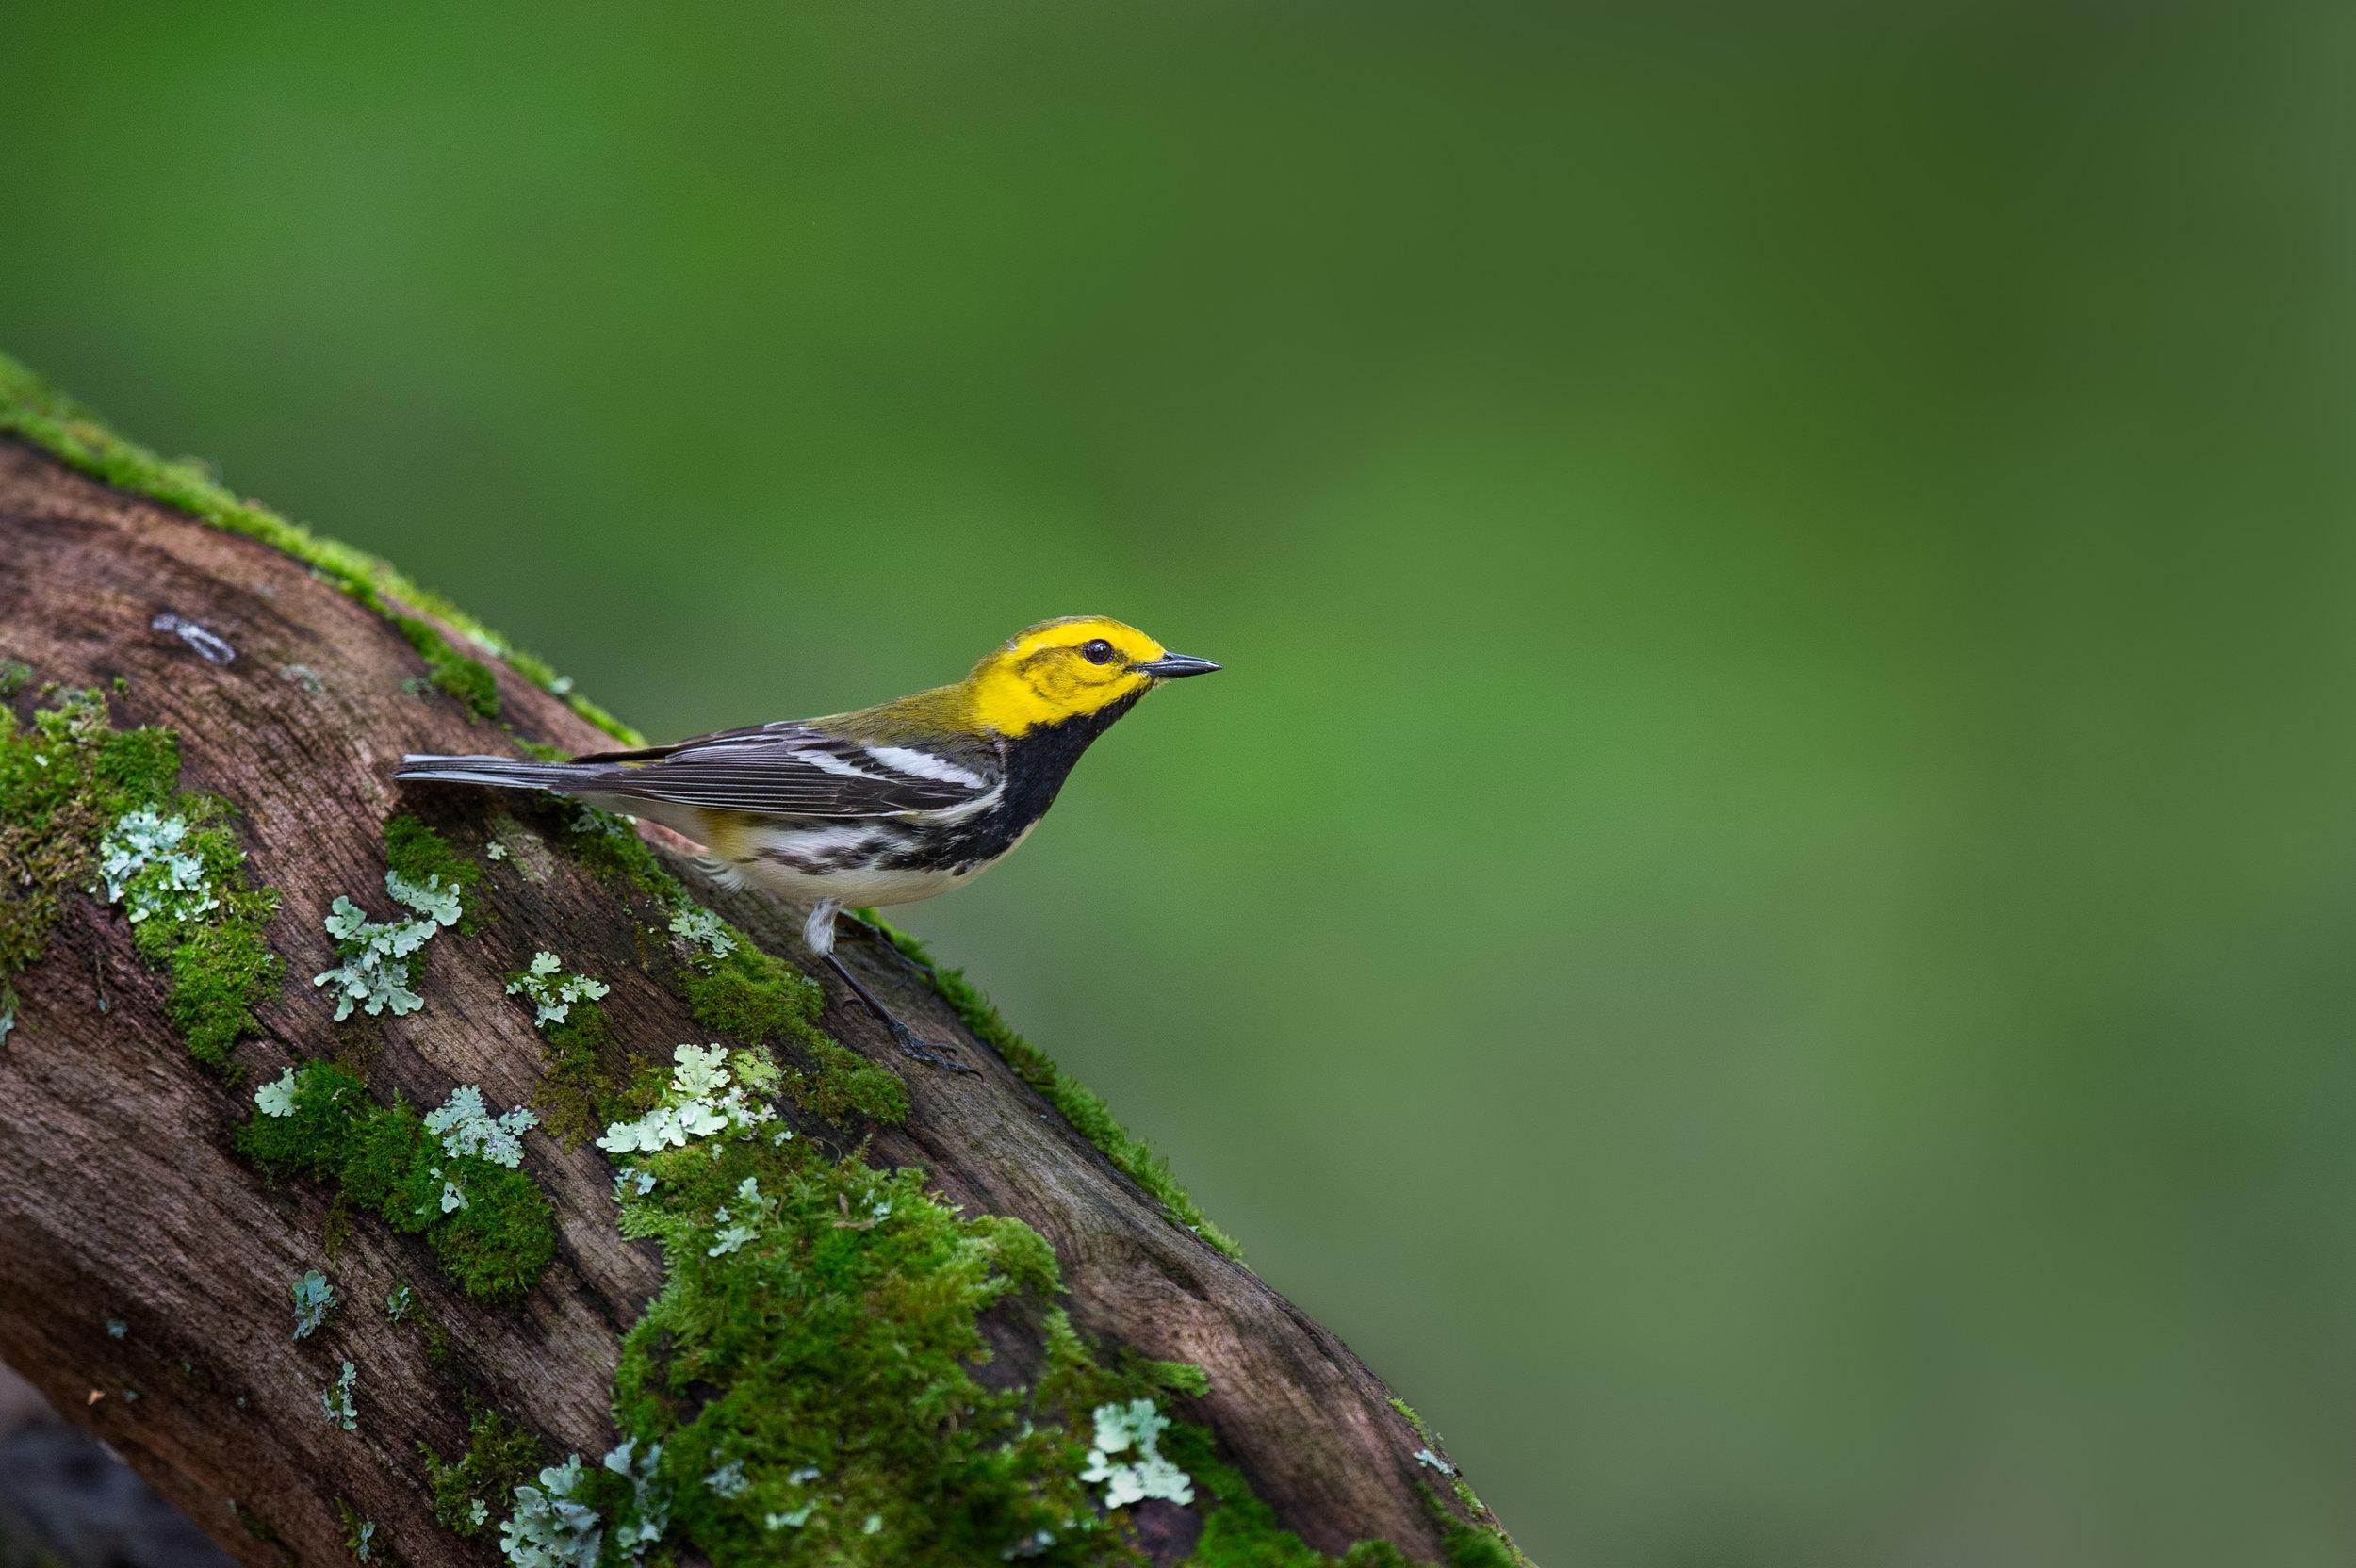 06_Black-throated Green Warbler on Mossy Log.jpg